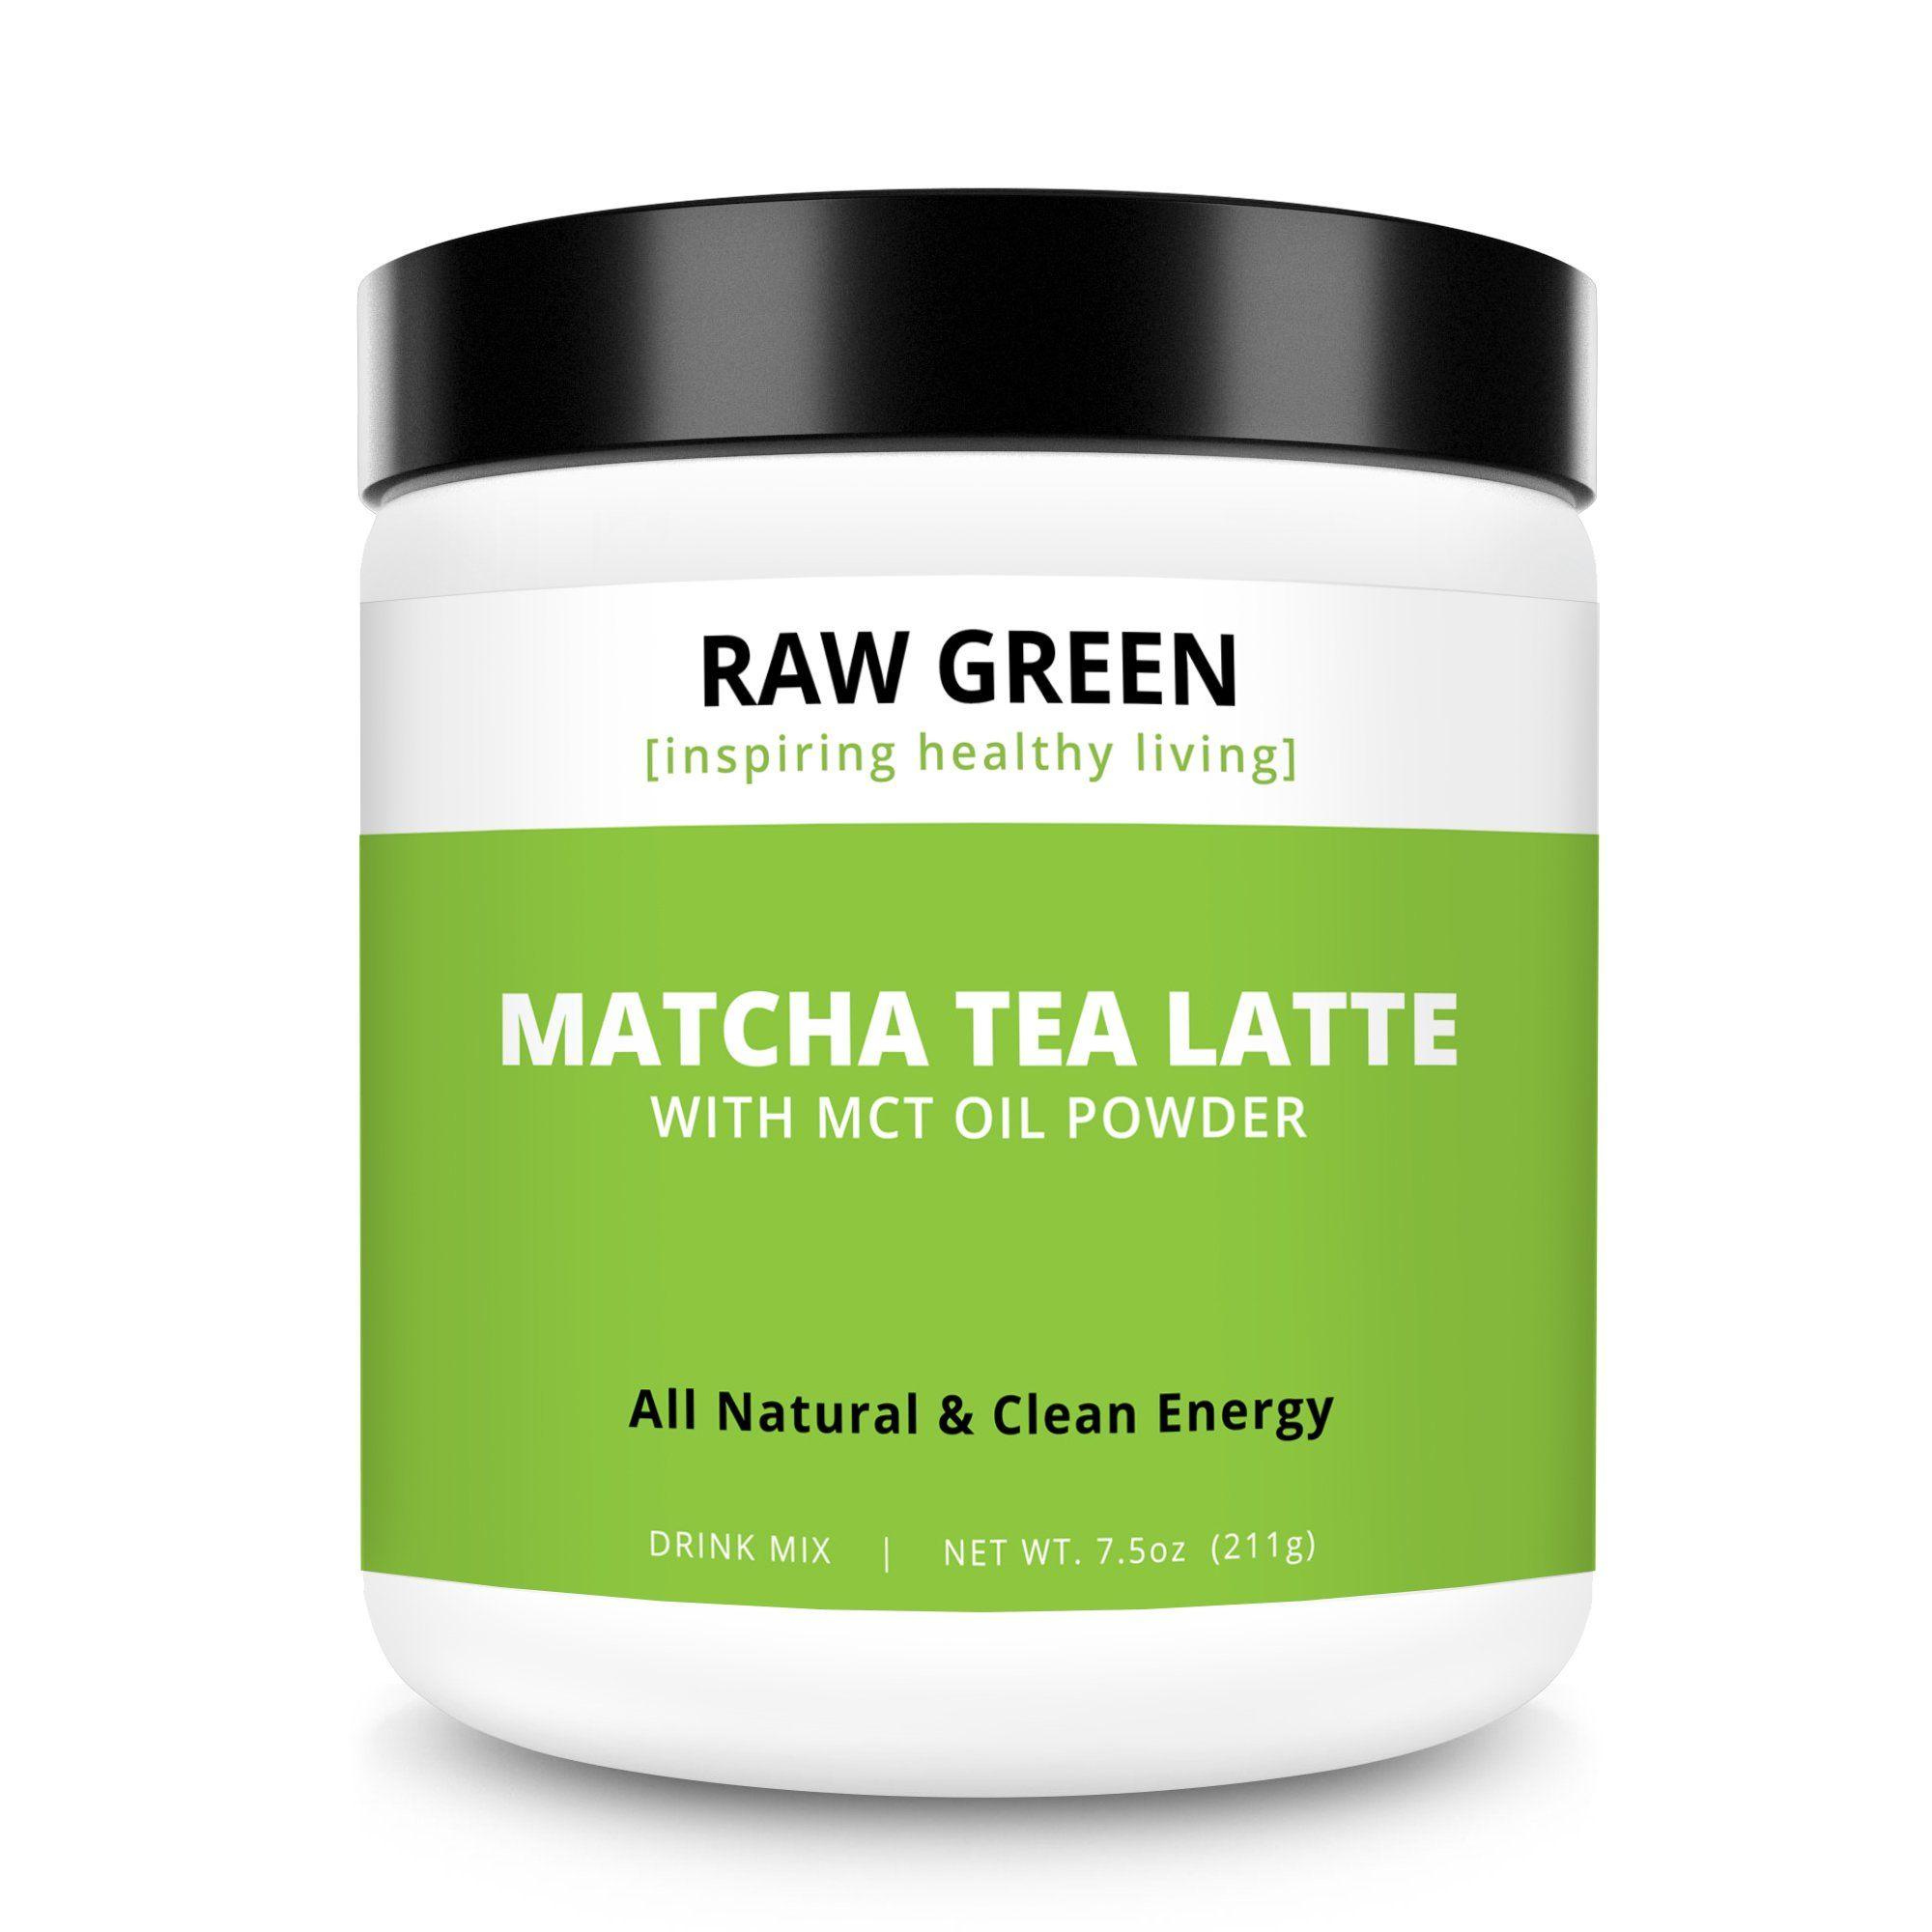 Matcha Tea Latte With MCT Oil Powder